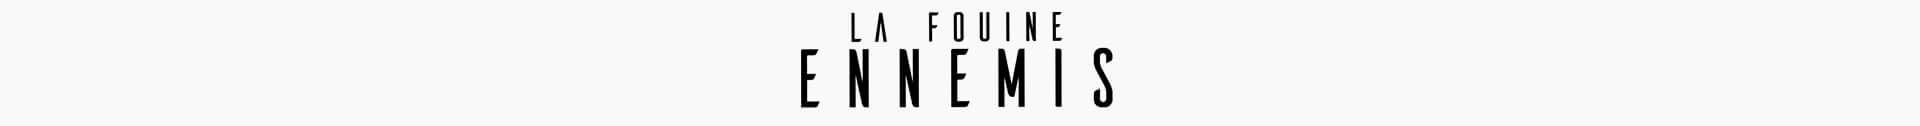 Ennemis_FOUINE_SEMPLICE_WB_01_02